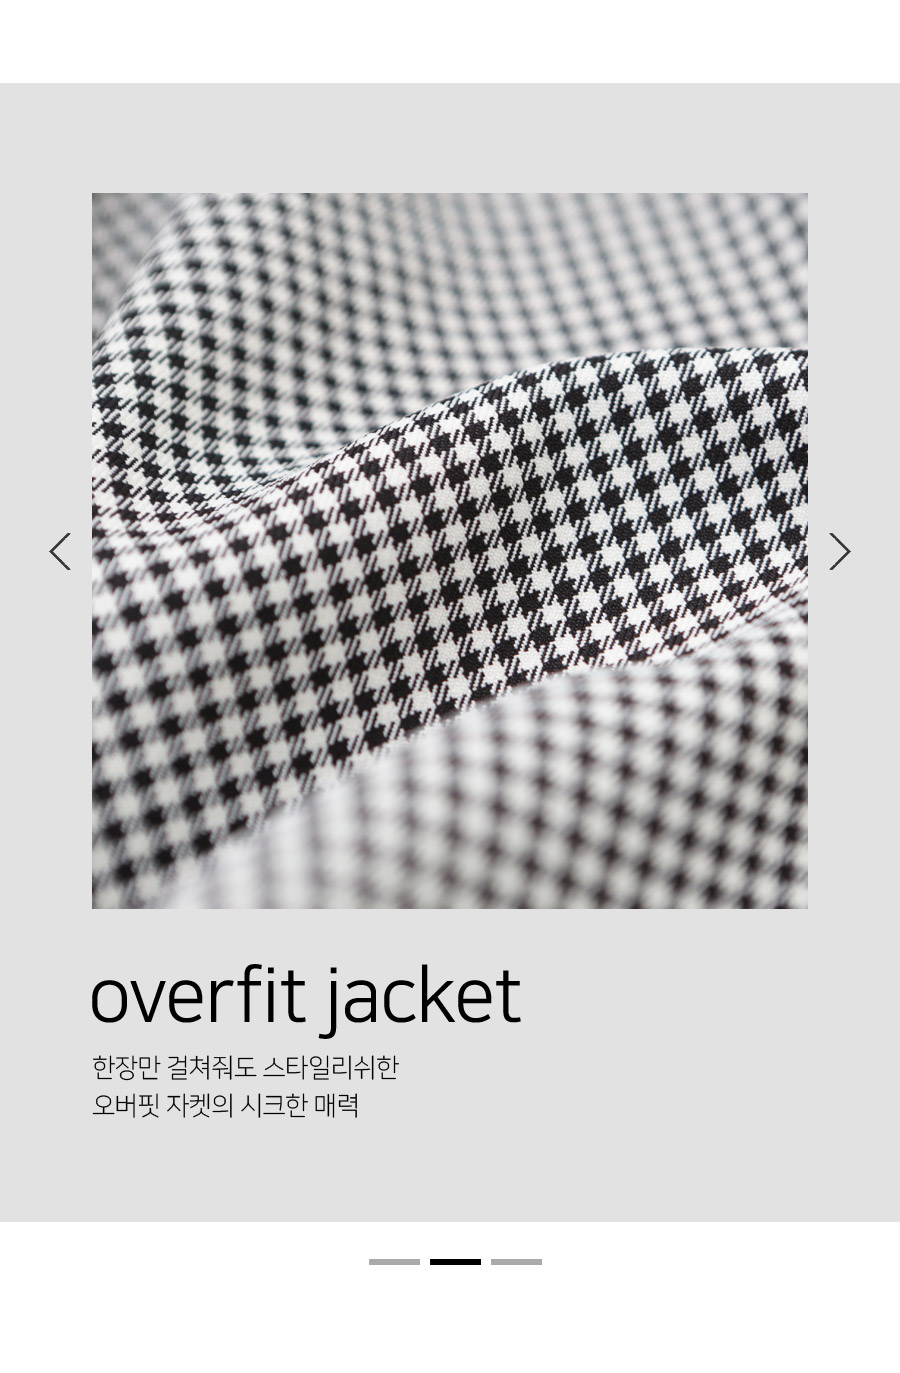 Oldin check o buffet jacket